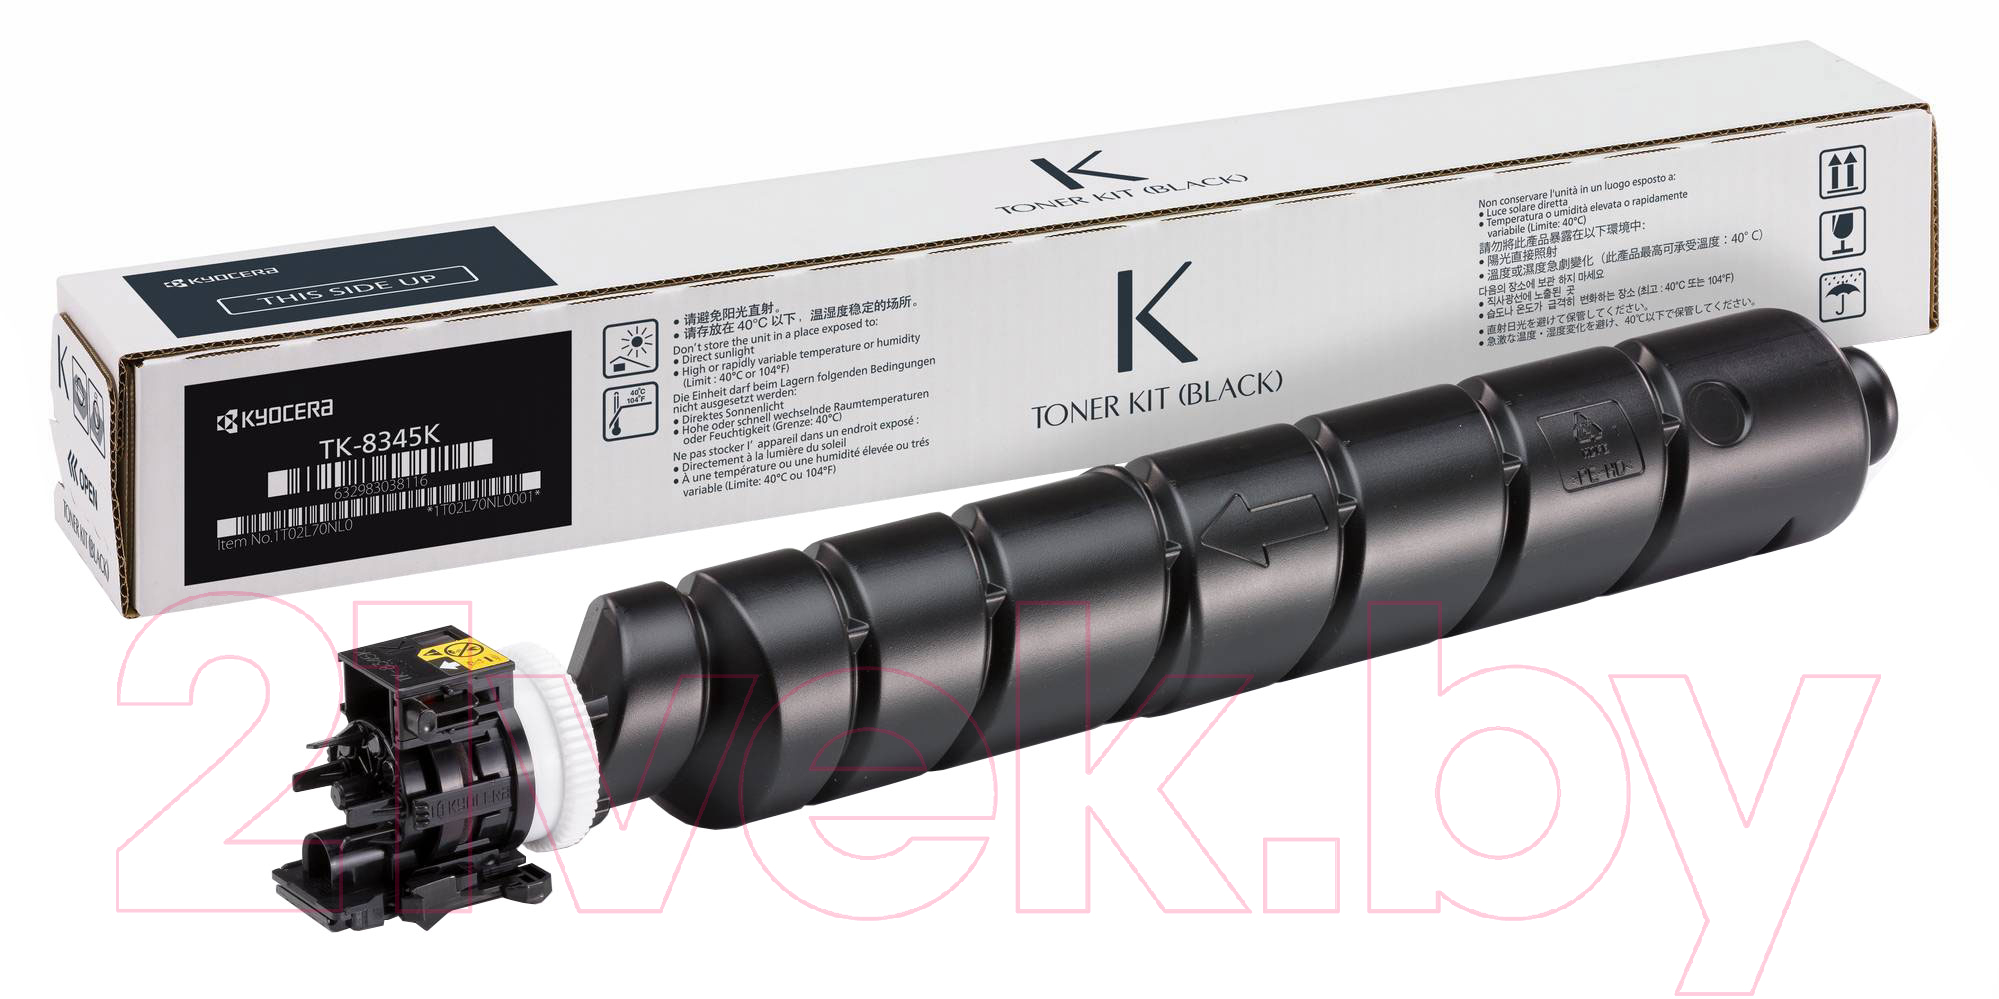 Купить Тонер-картридж Kyocera Mita, TK-8345K, Китай, черный